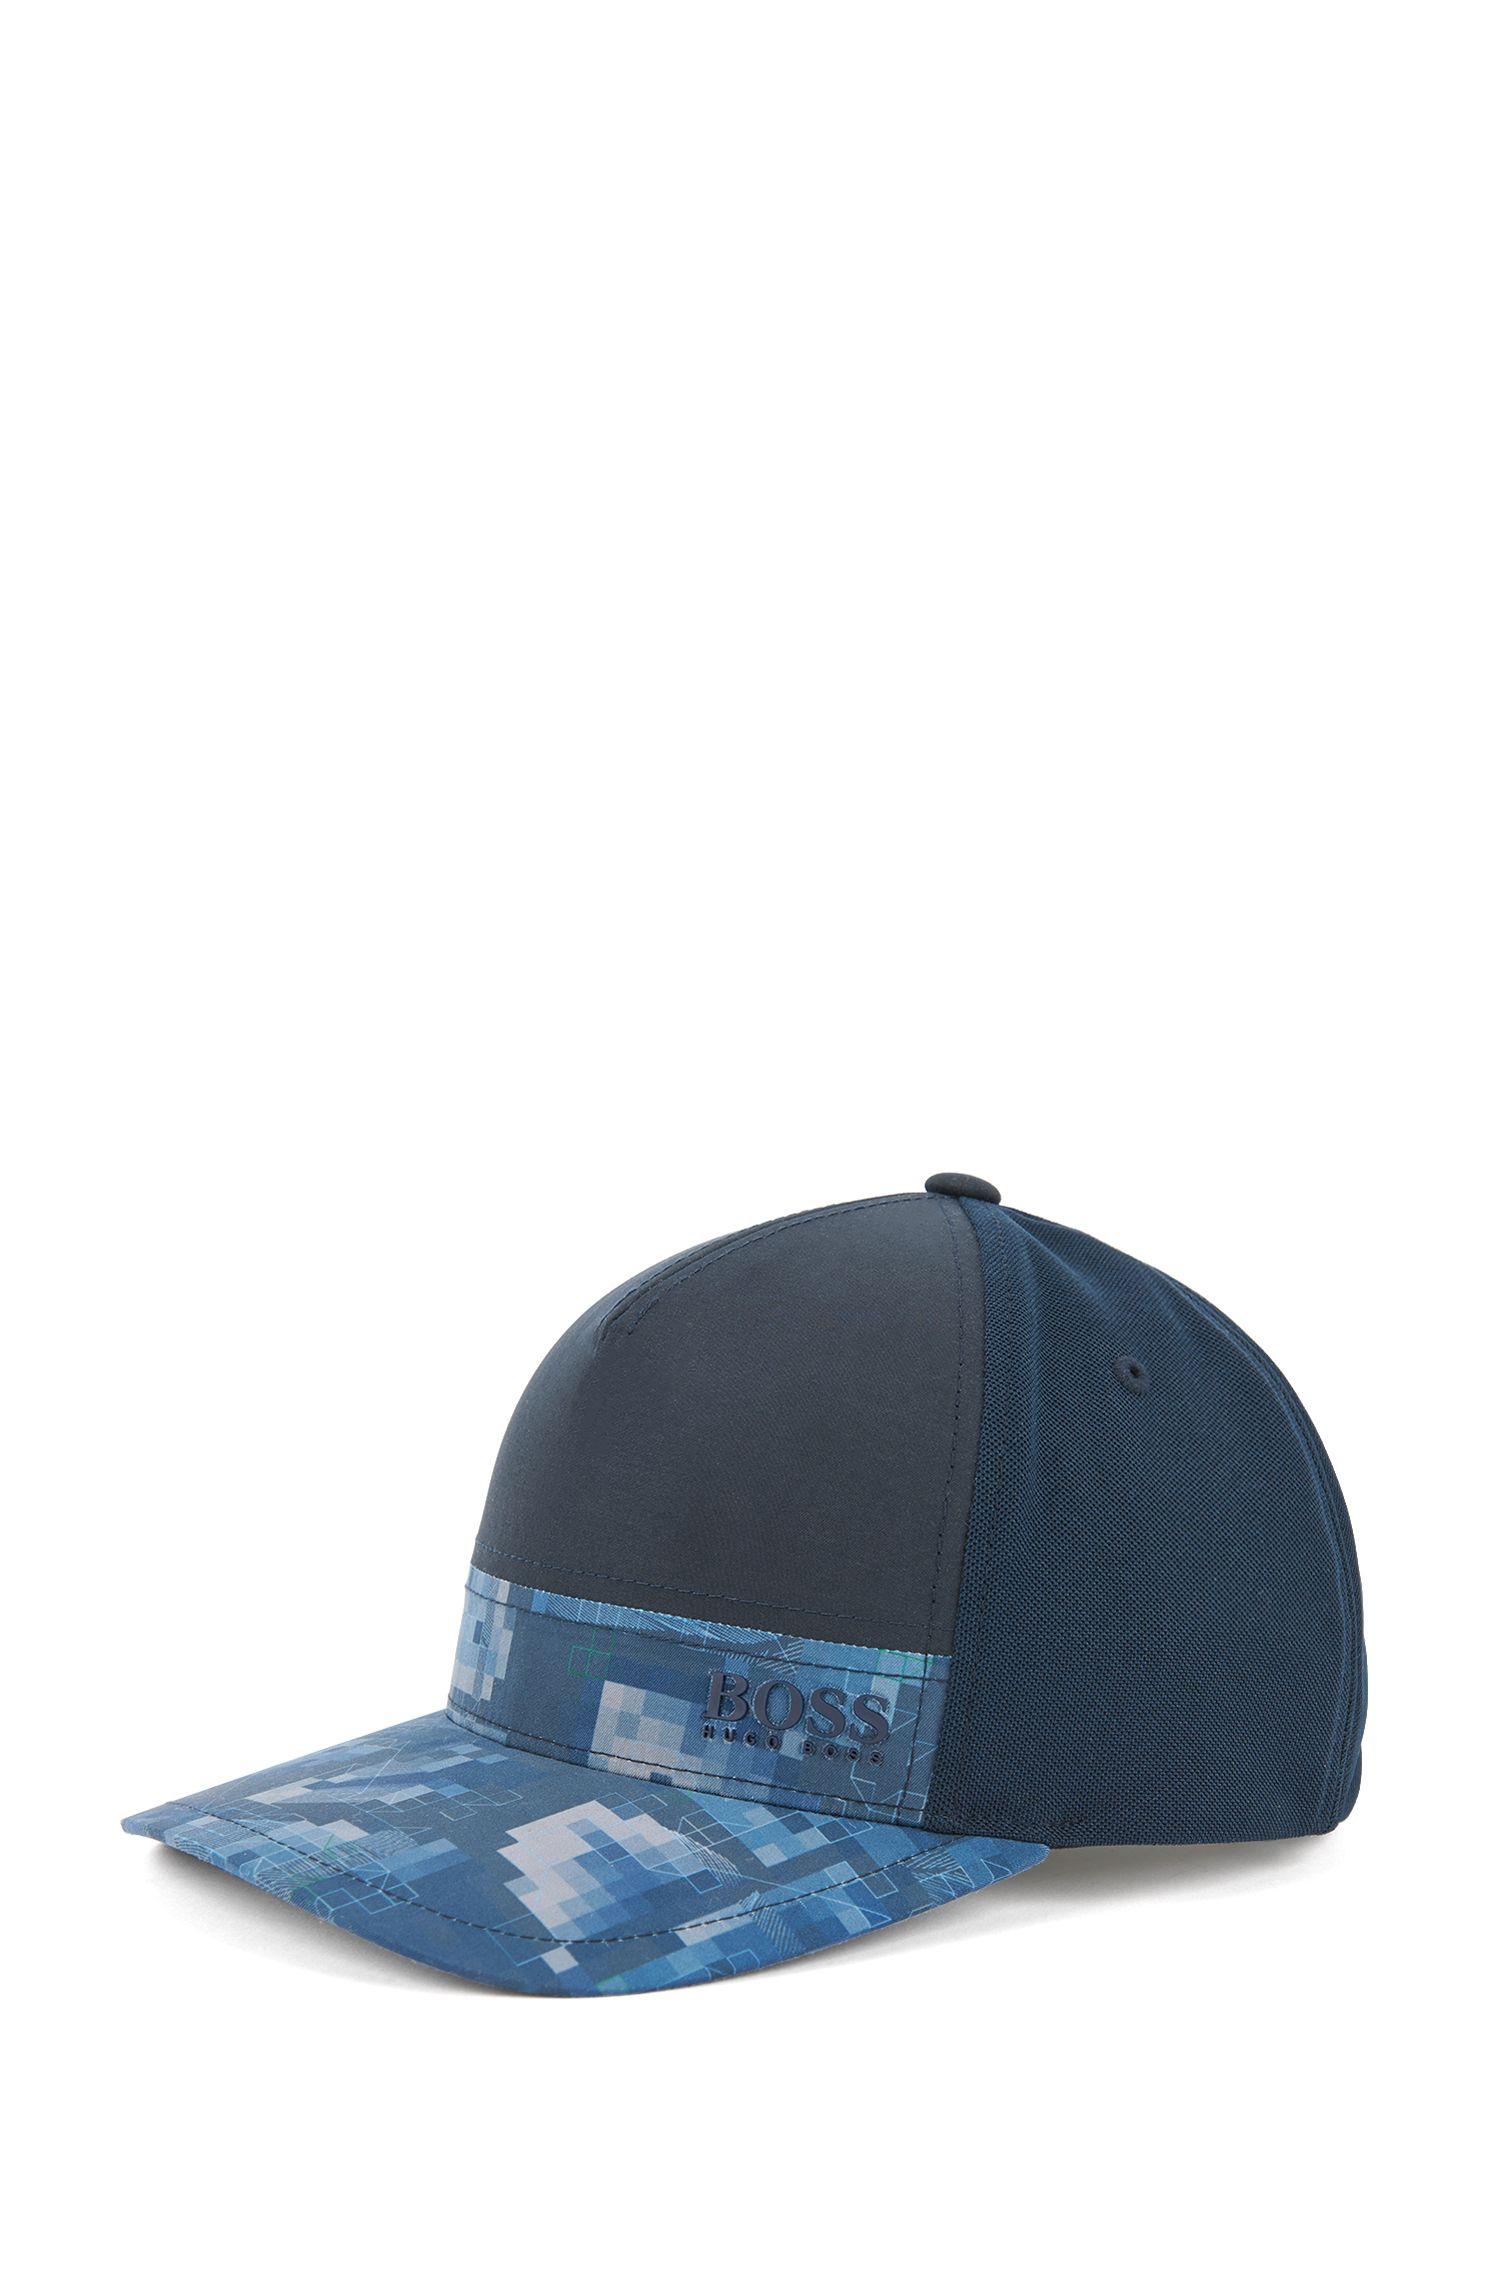 Digi-Camo Colorblock Baseball Cap | Printcap